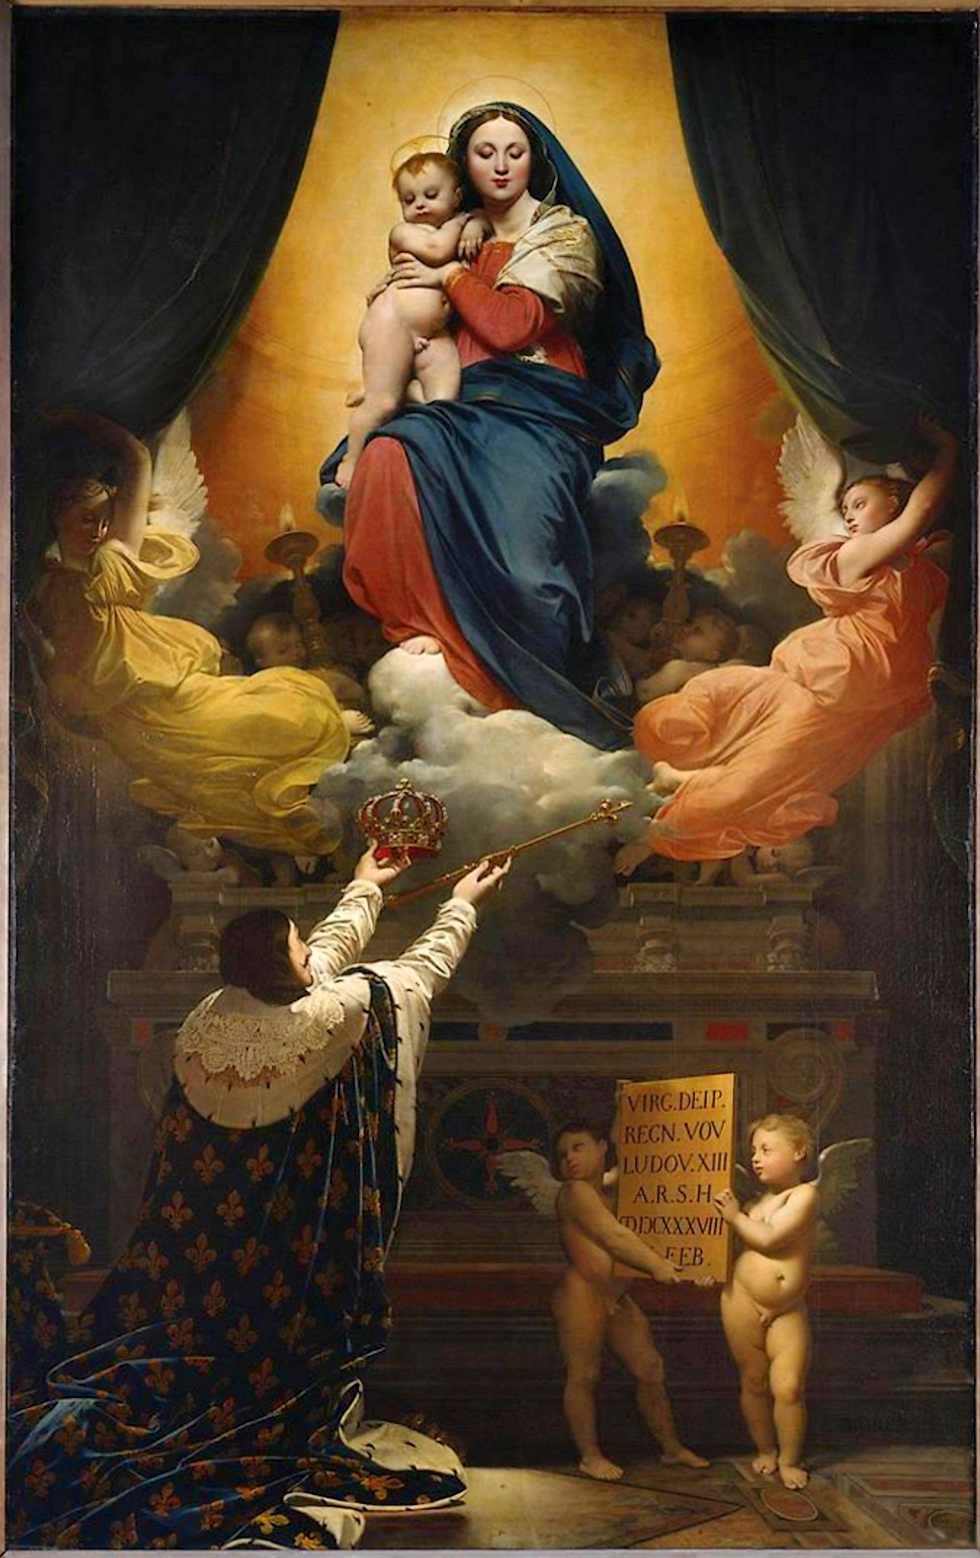 Figura 22 - J.-D.-A. Ingres. O voto de Luis XIII (1824). Montauban, Catedral.